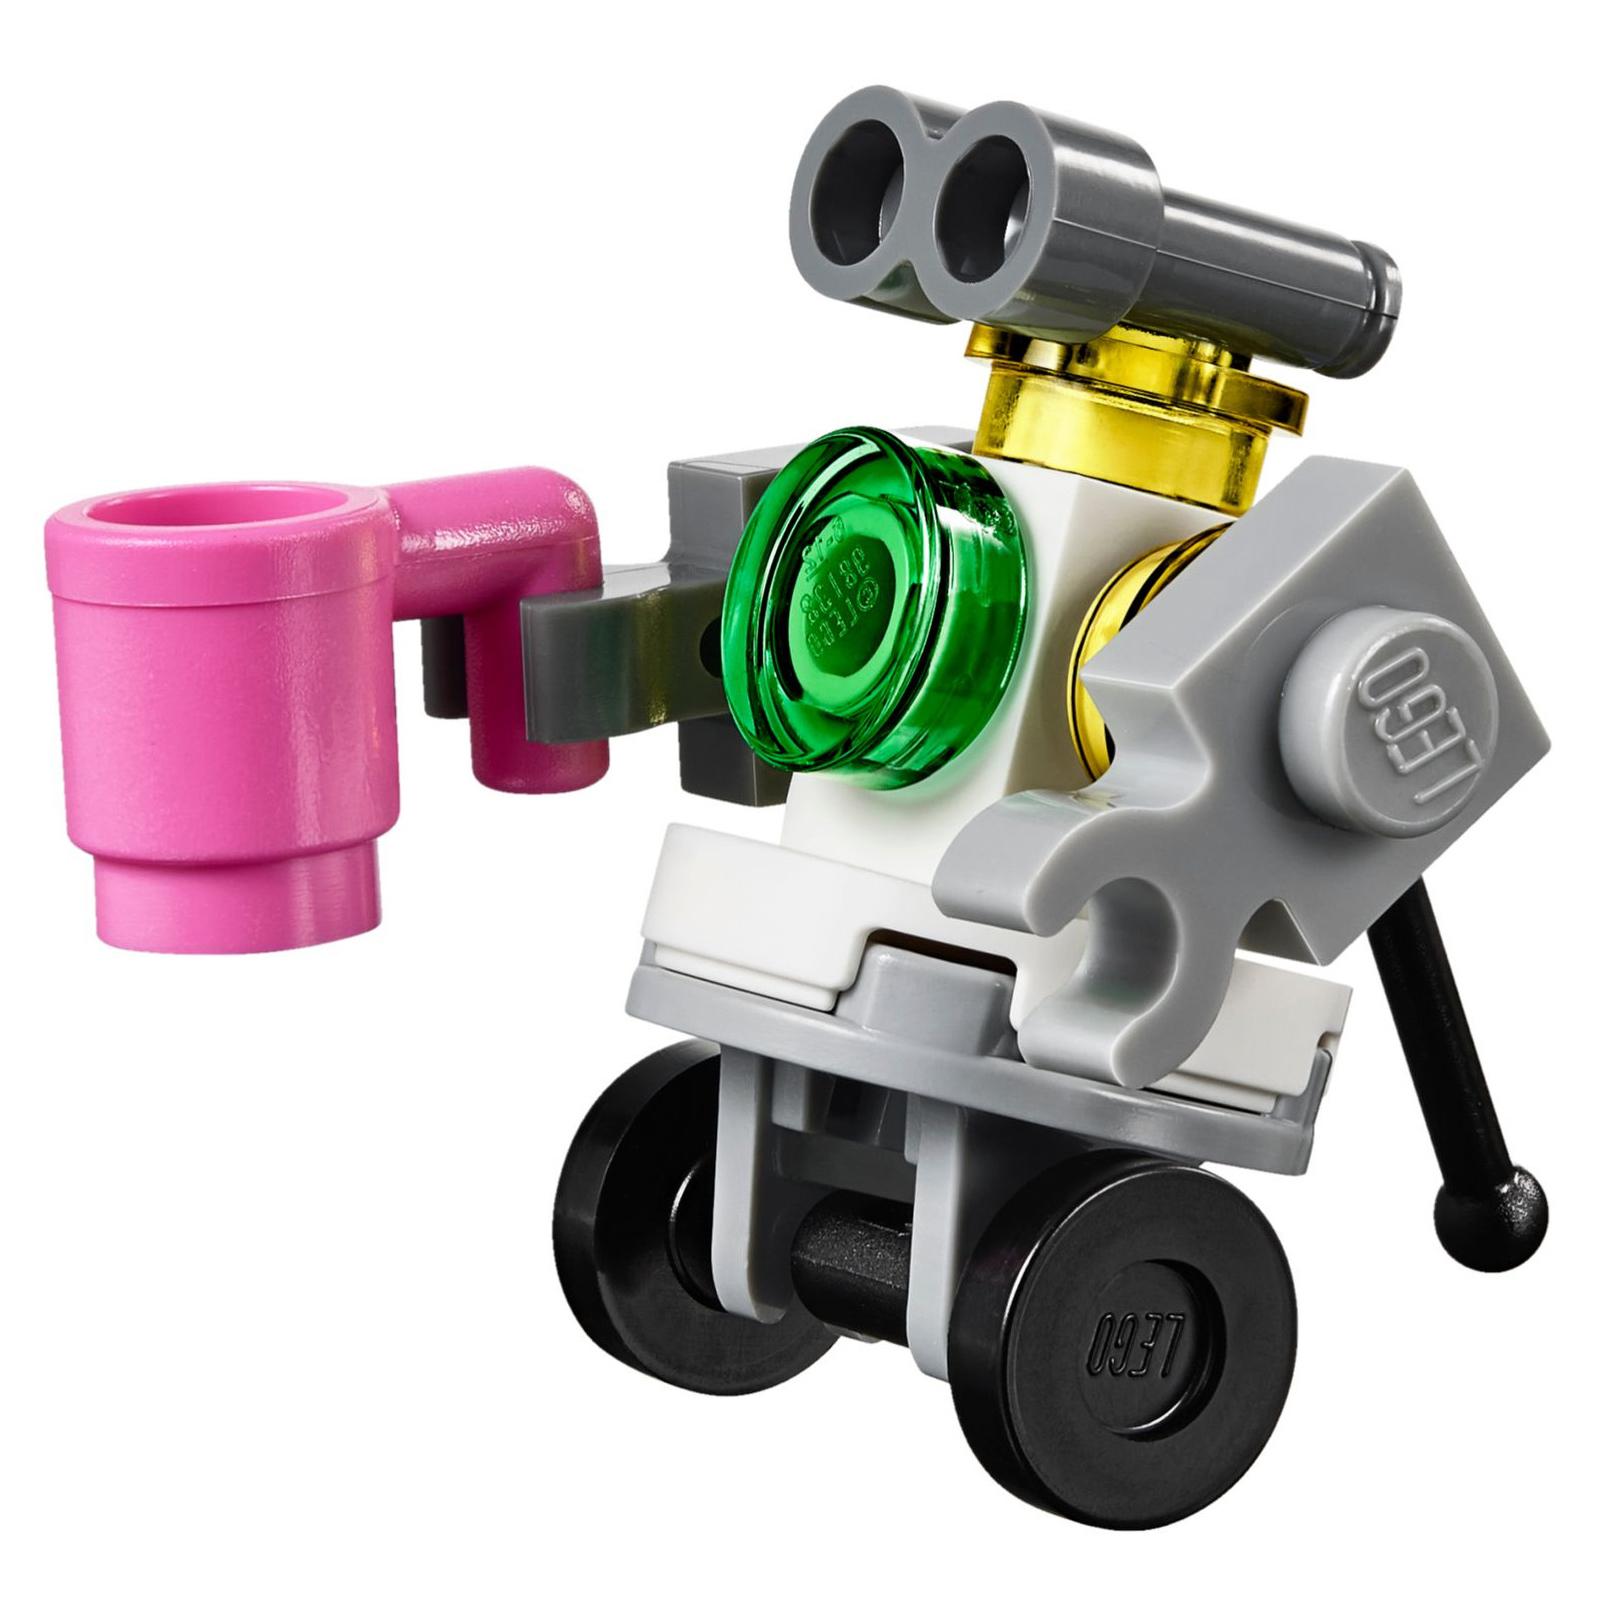 Конструктор LEGO Friends Звездное небо Оливии (41116) изображение 8